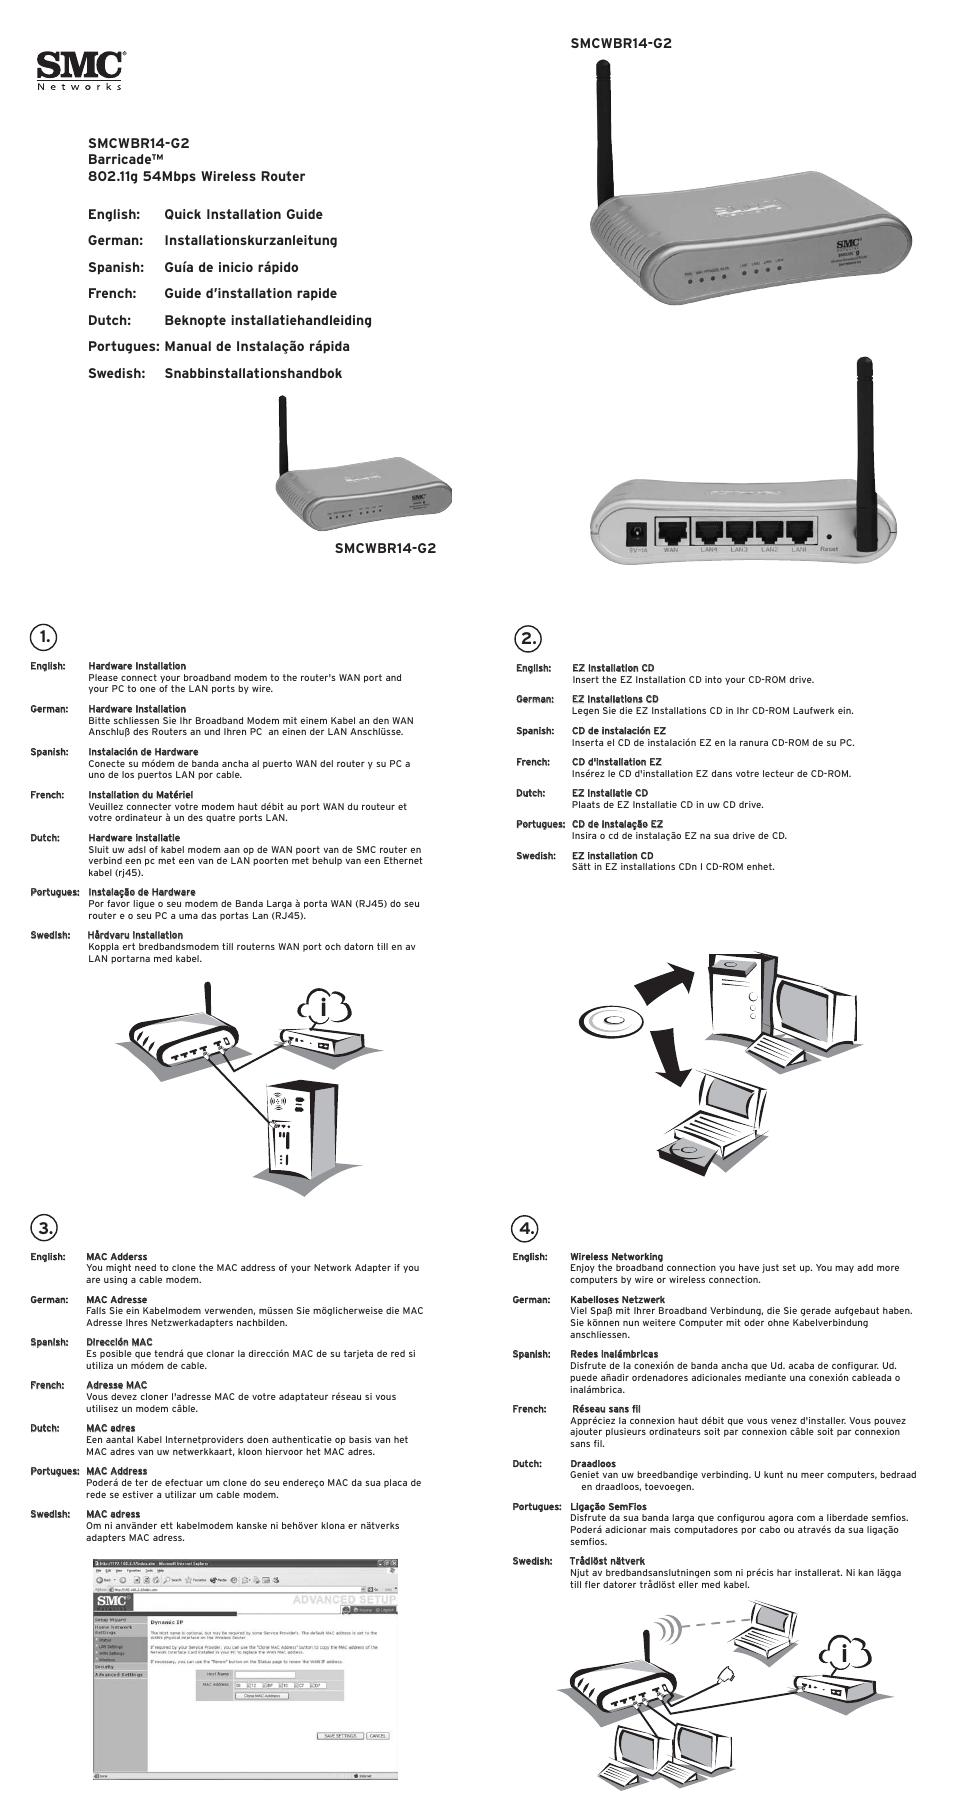 Wiring Diagram For Smc Modem Simple Schema Manifold Networks Barricade Smcwbr14 G2 User Manual 2 Pages Motion Sensor